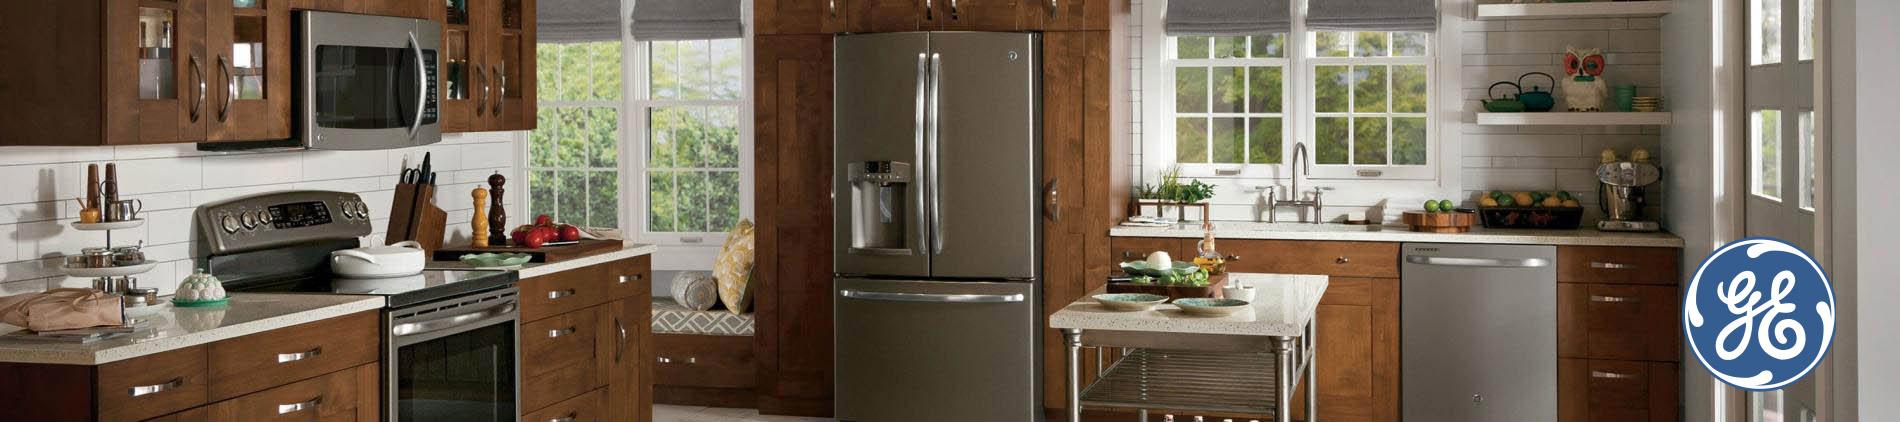 GE Slate appliances